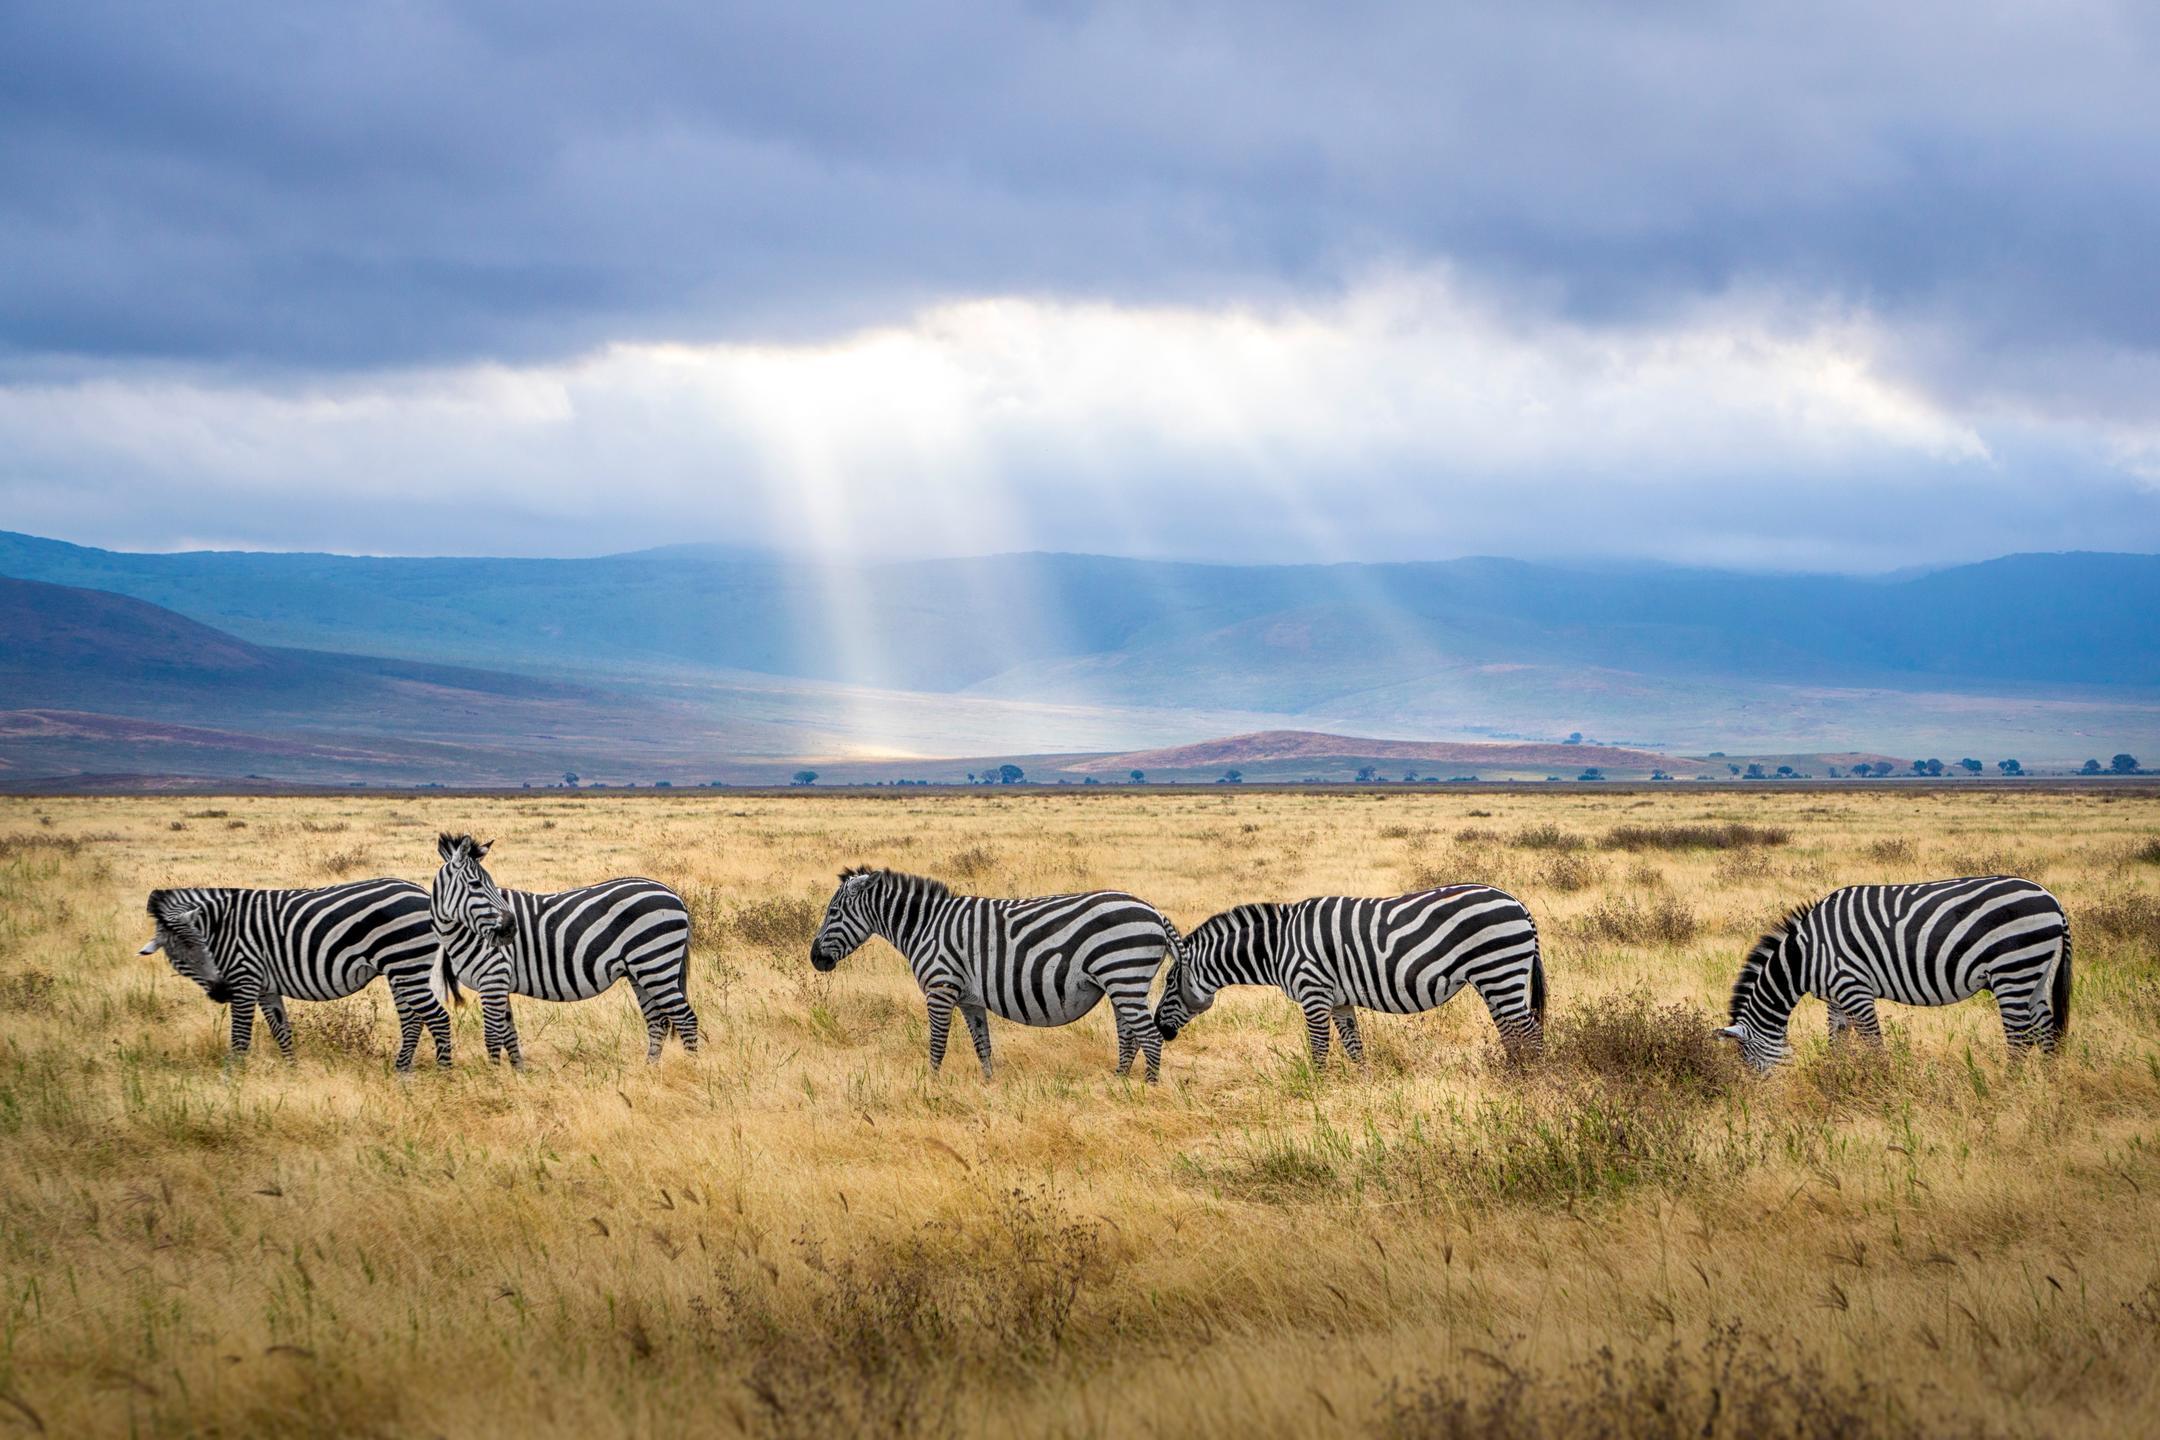 Zebra in savannah grass